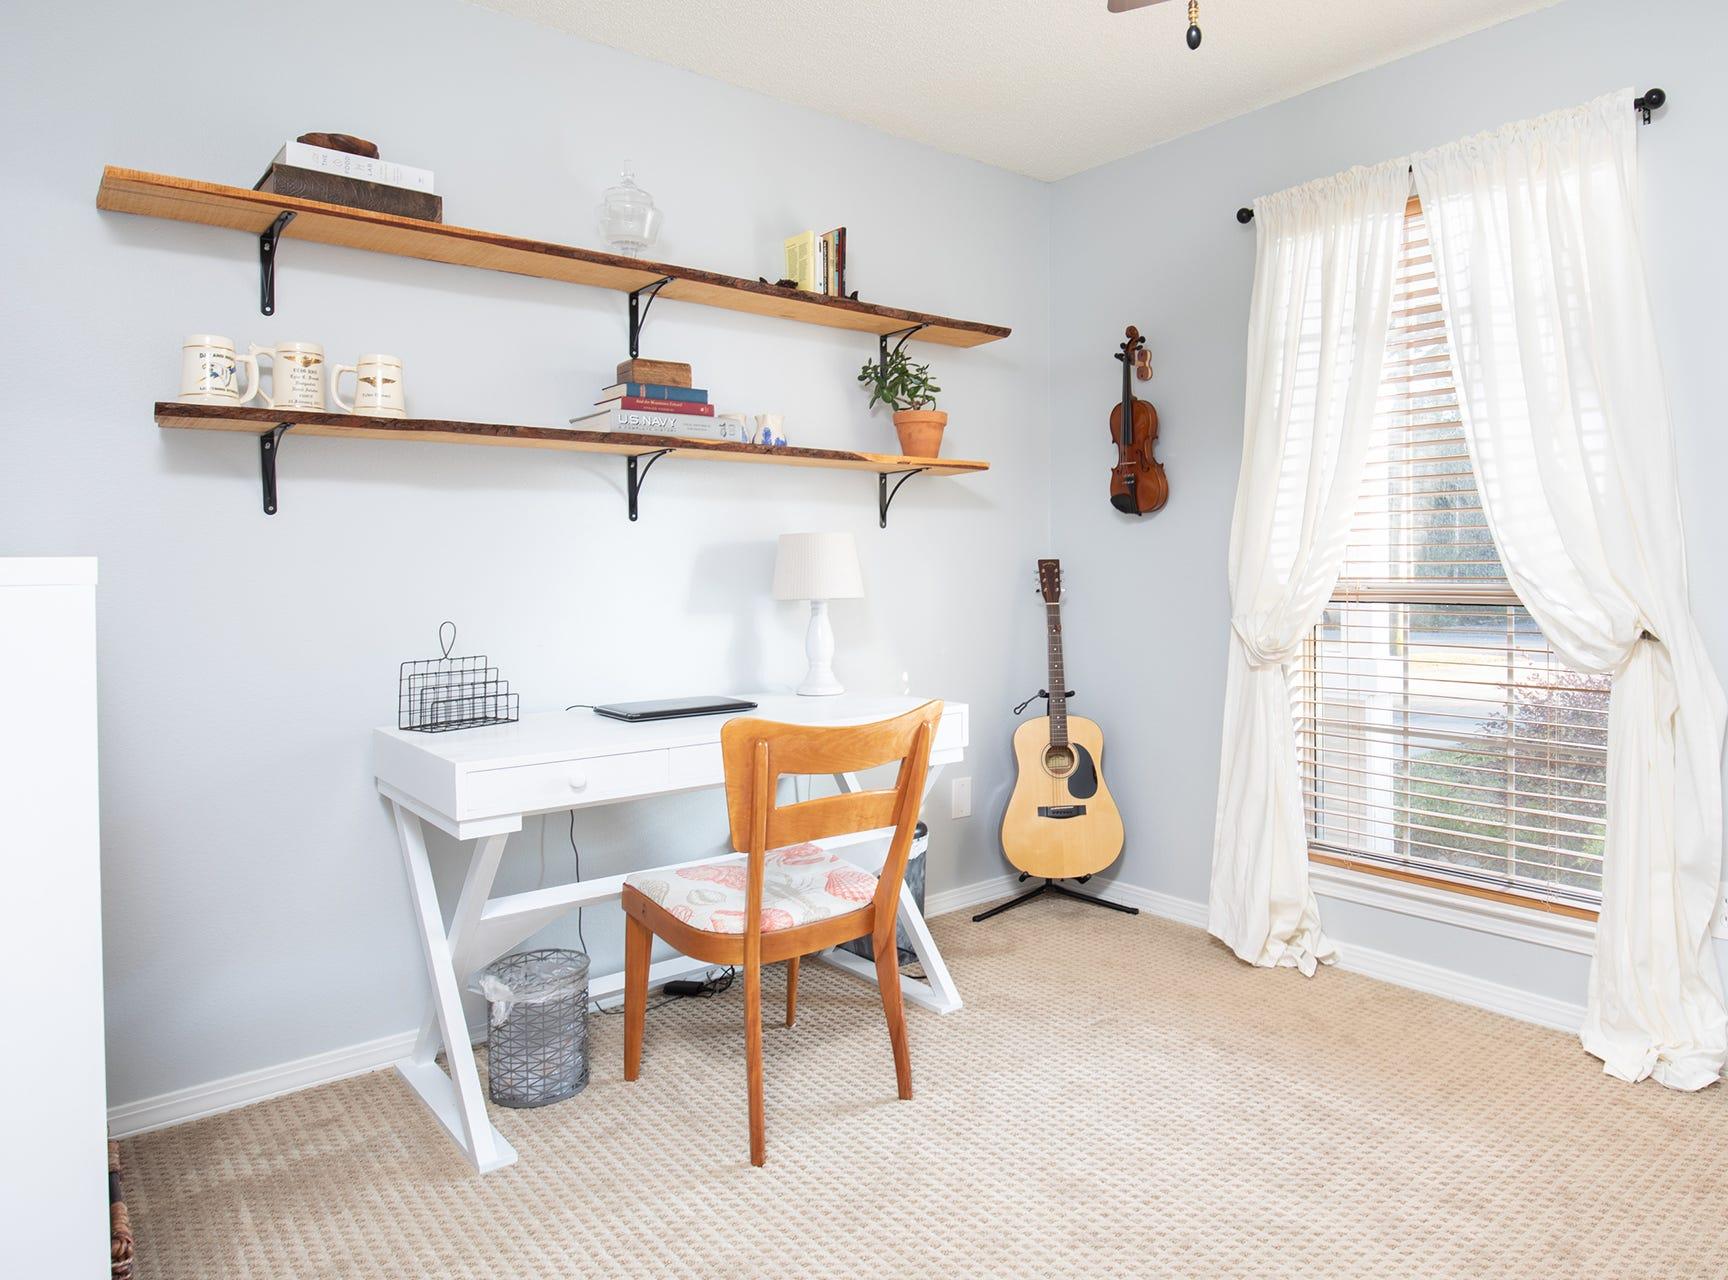 1516 East Brainerd St.An additional bedroom.